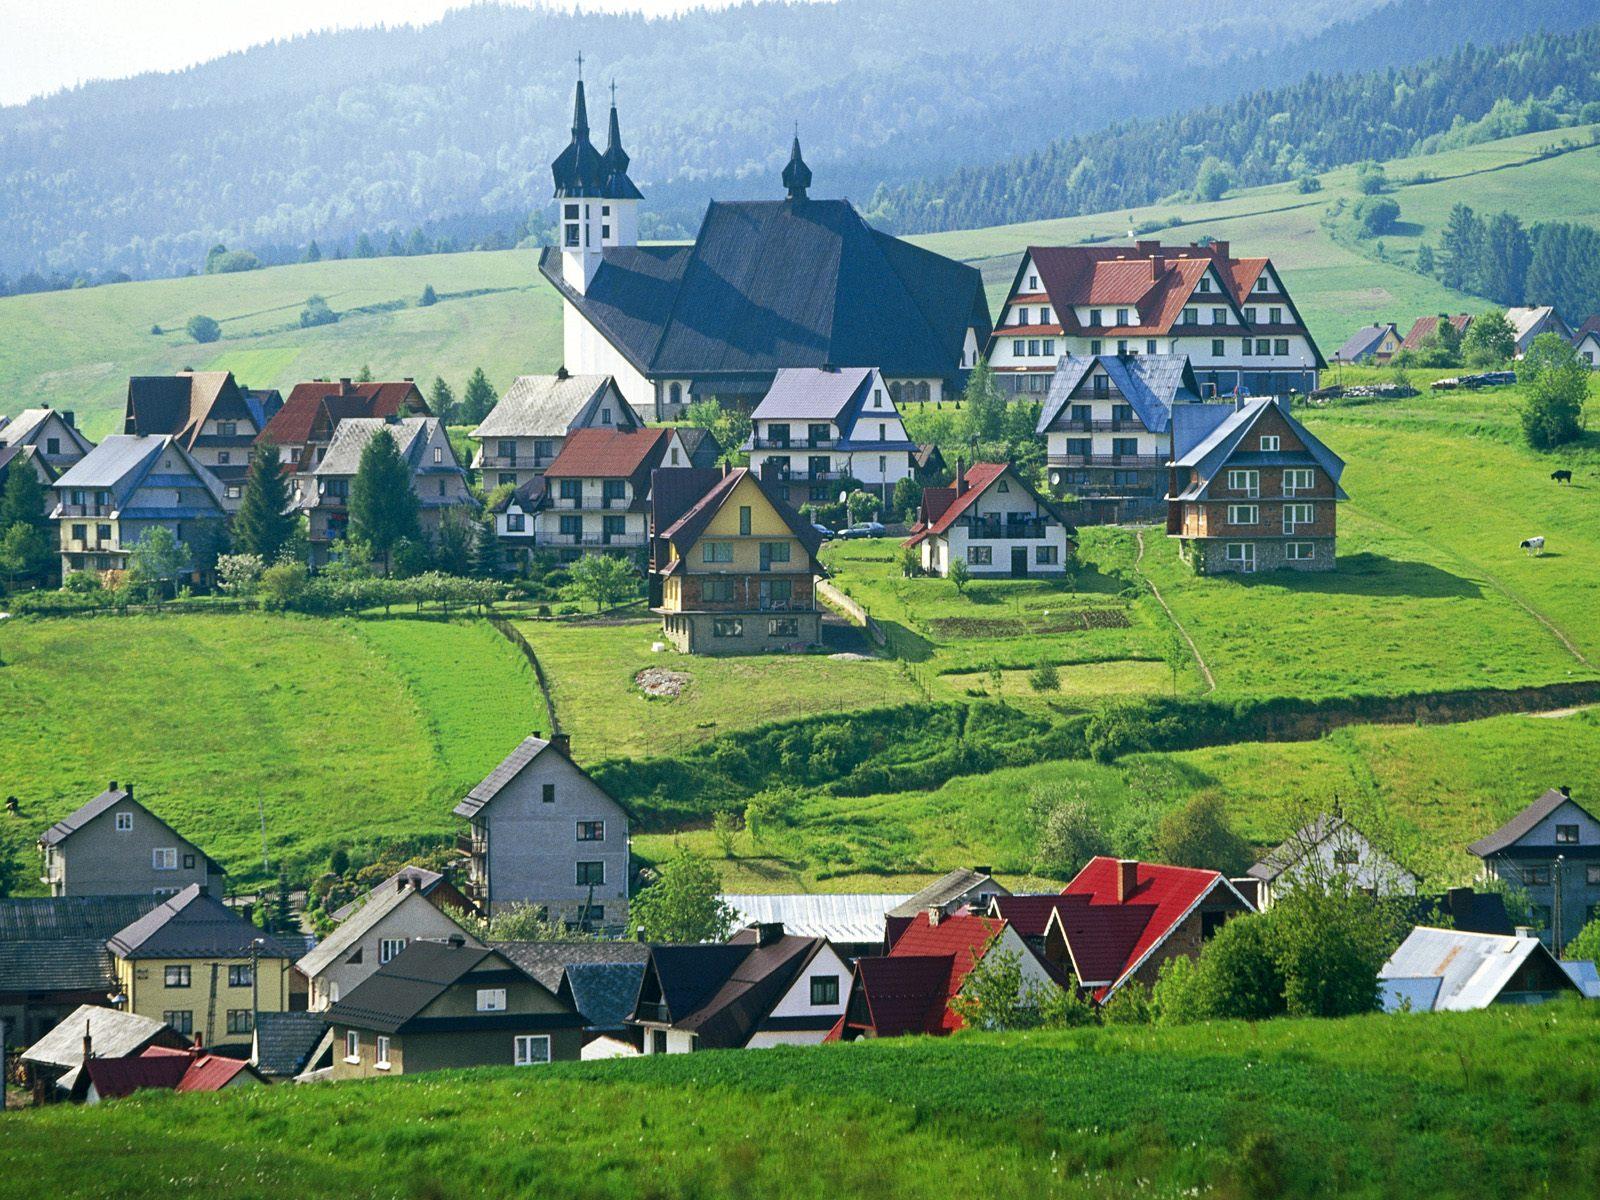 Pieniny_Kluszkowce_Tatra_Mountains_Poland